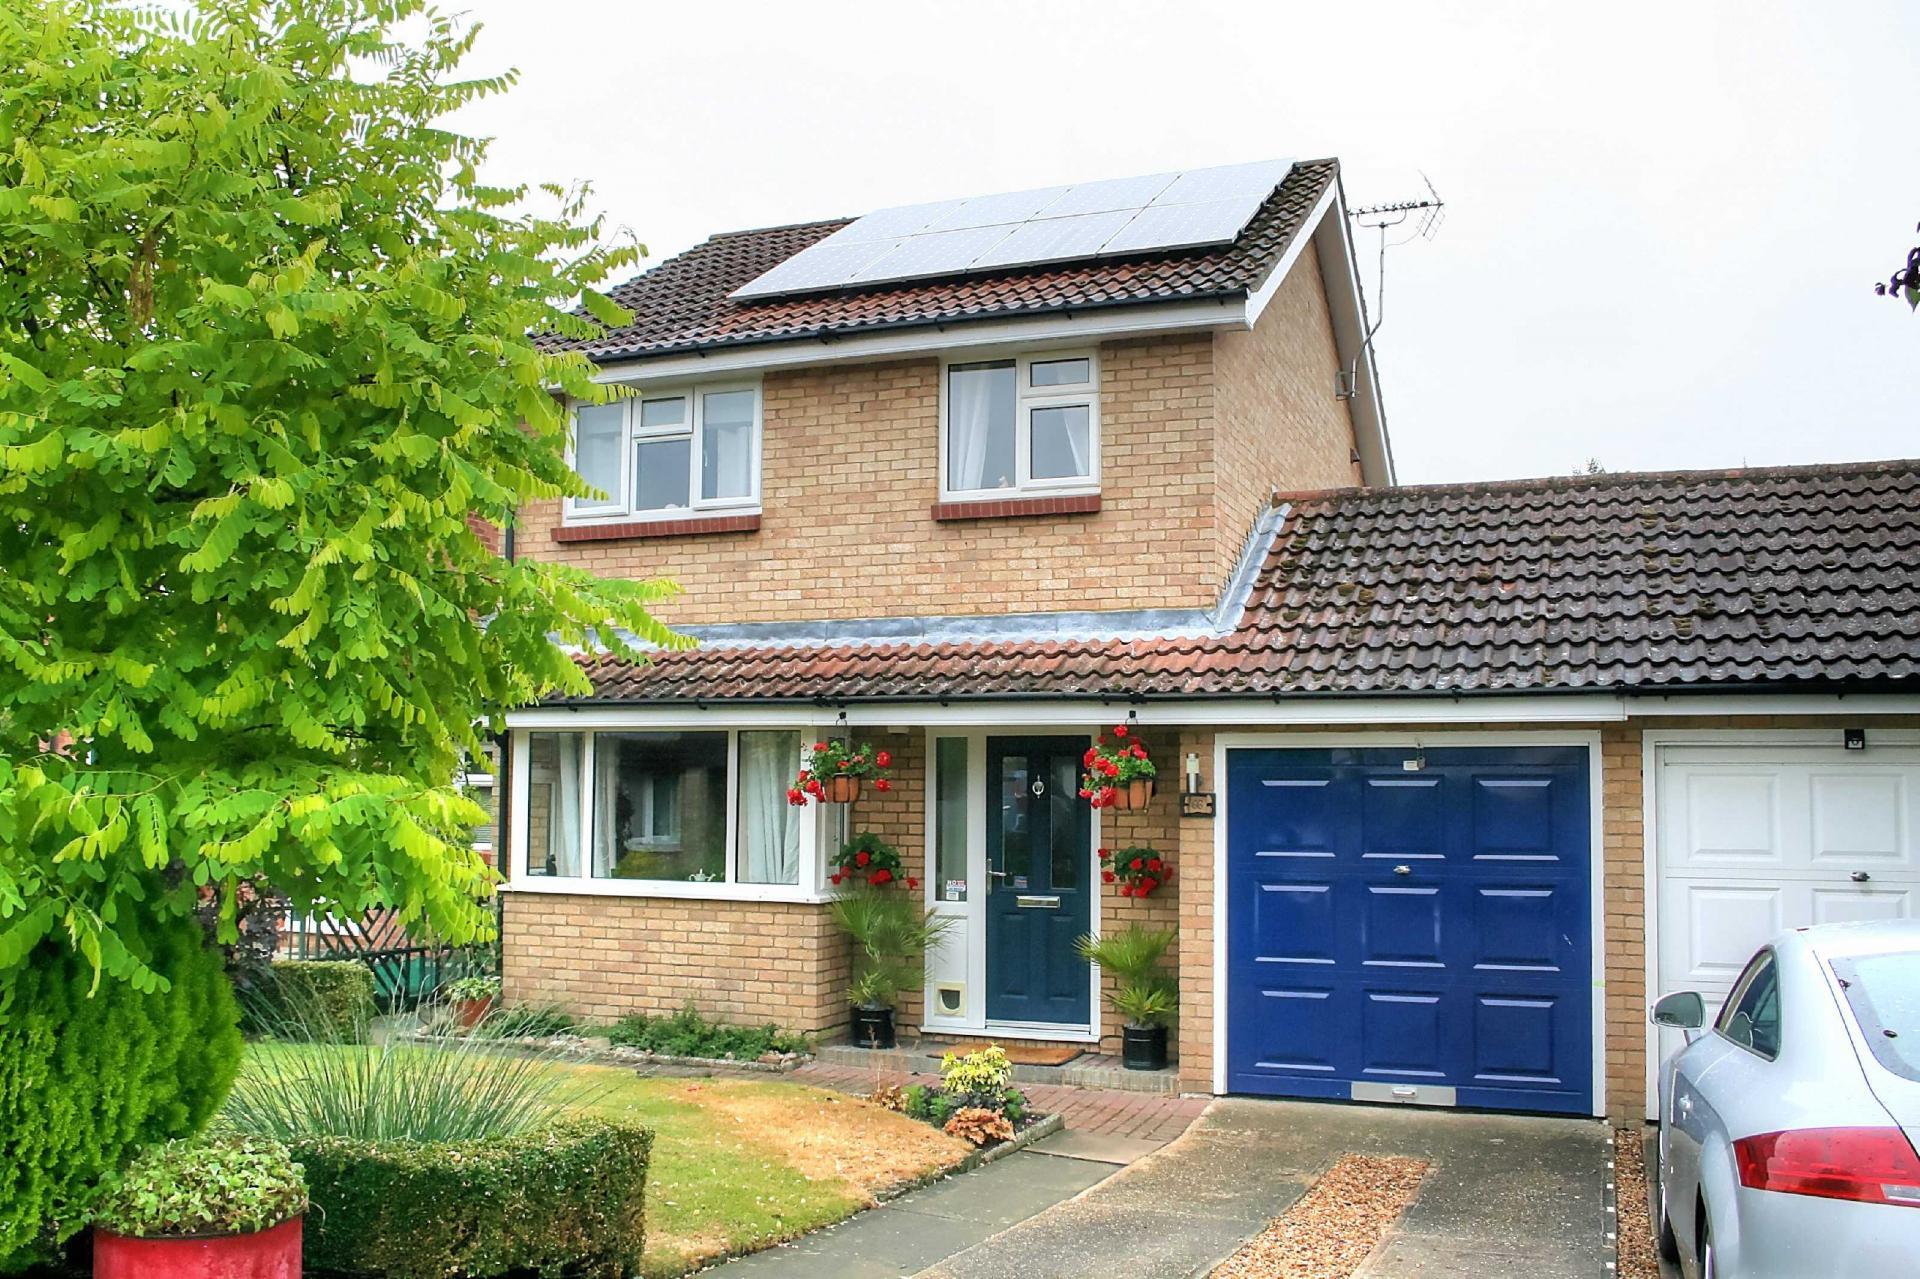 3 Bedroom Detached House For Sale In Cambridge